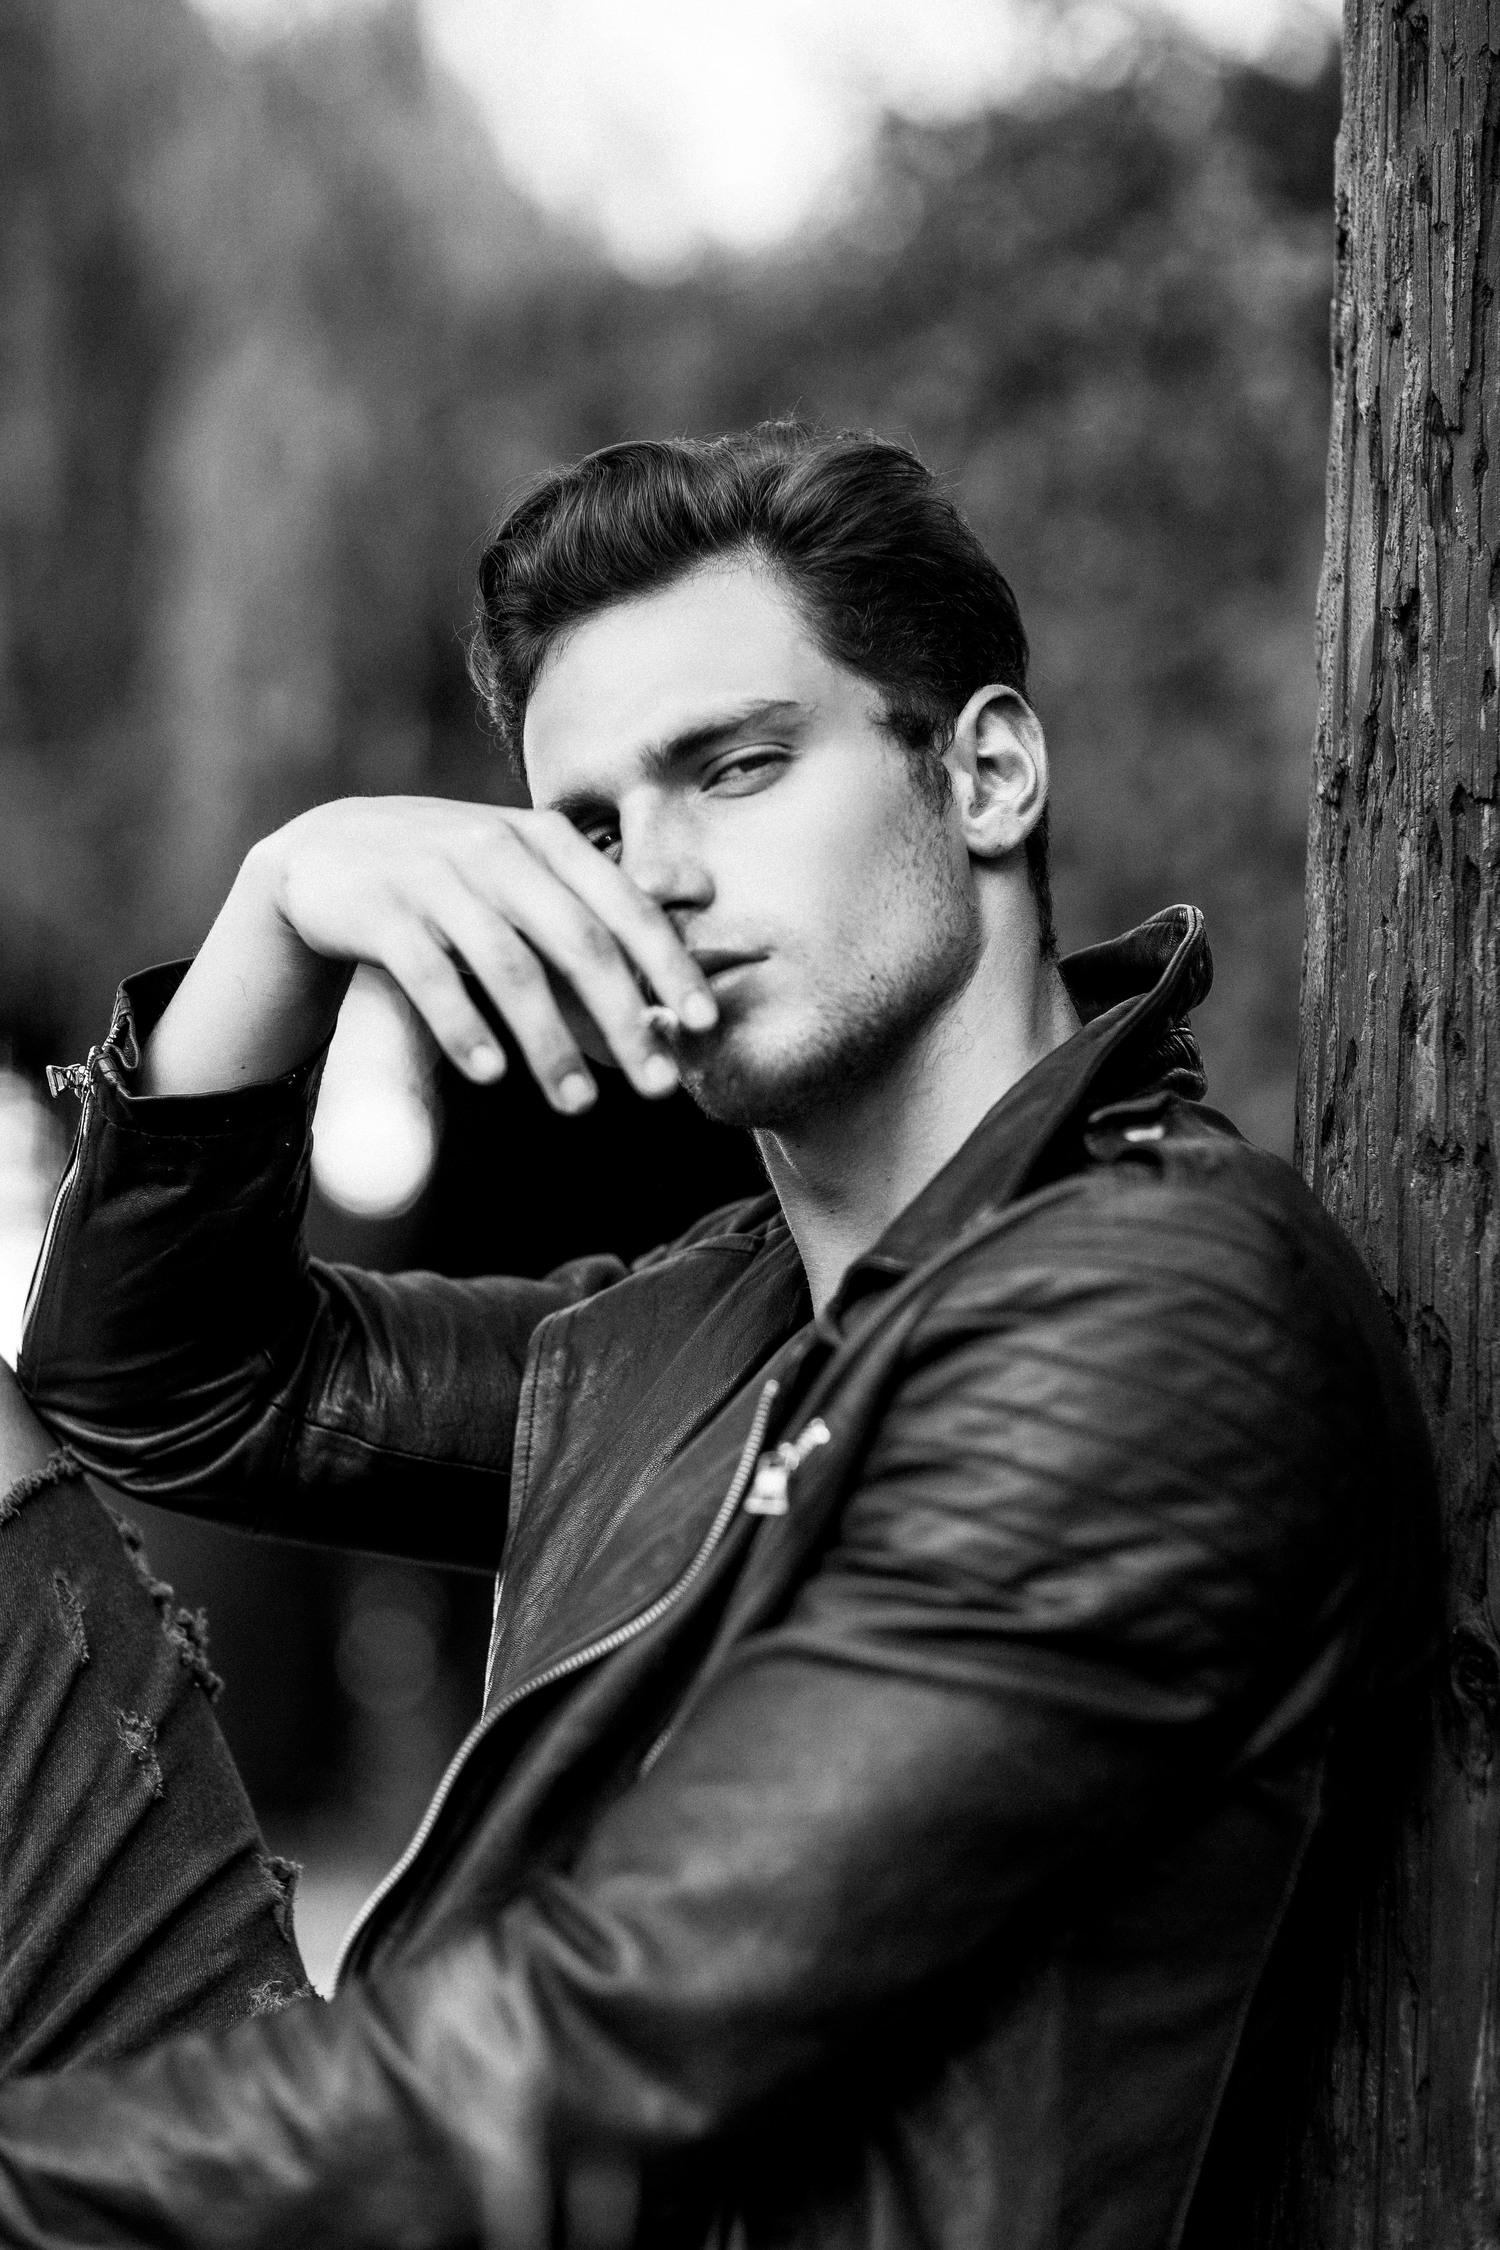 Adon Exclusive: Model Sven Rossa By Blake Ballard